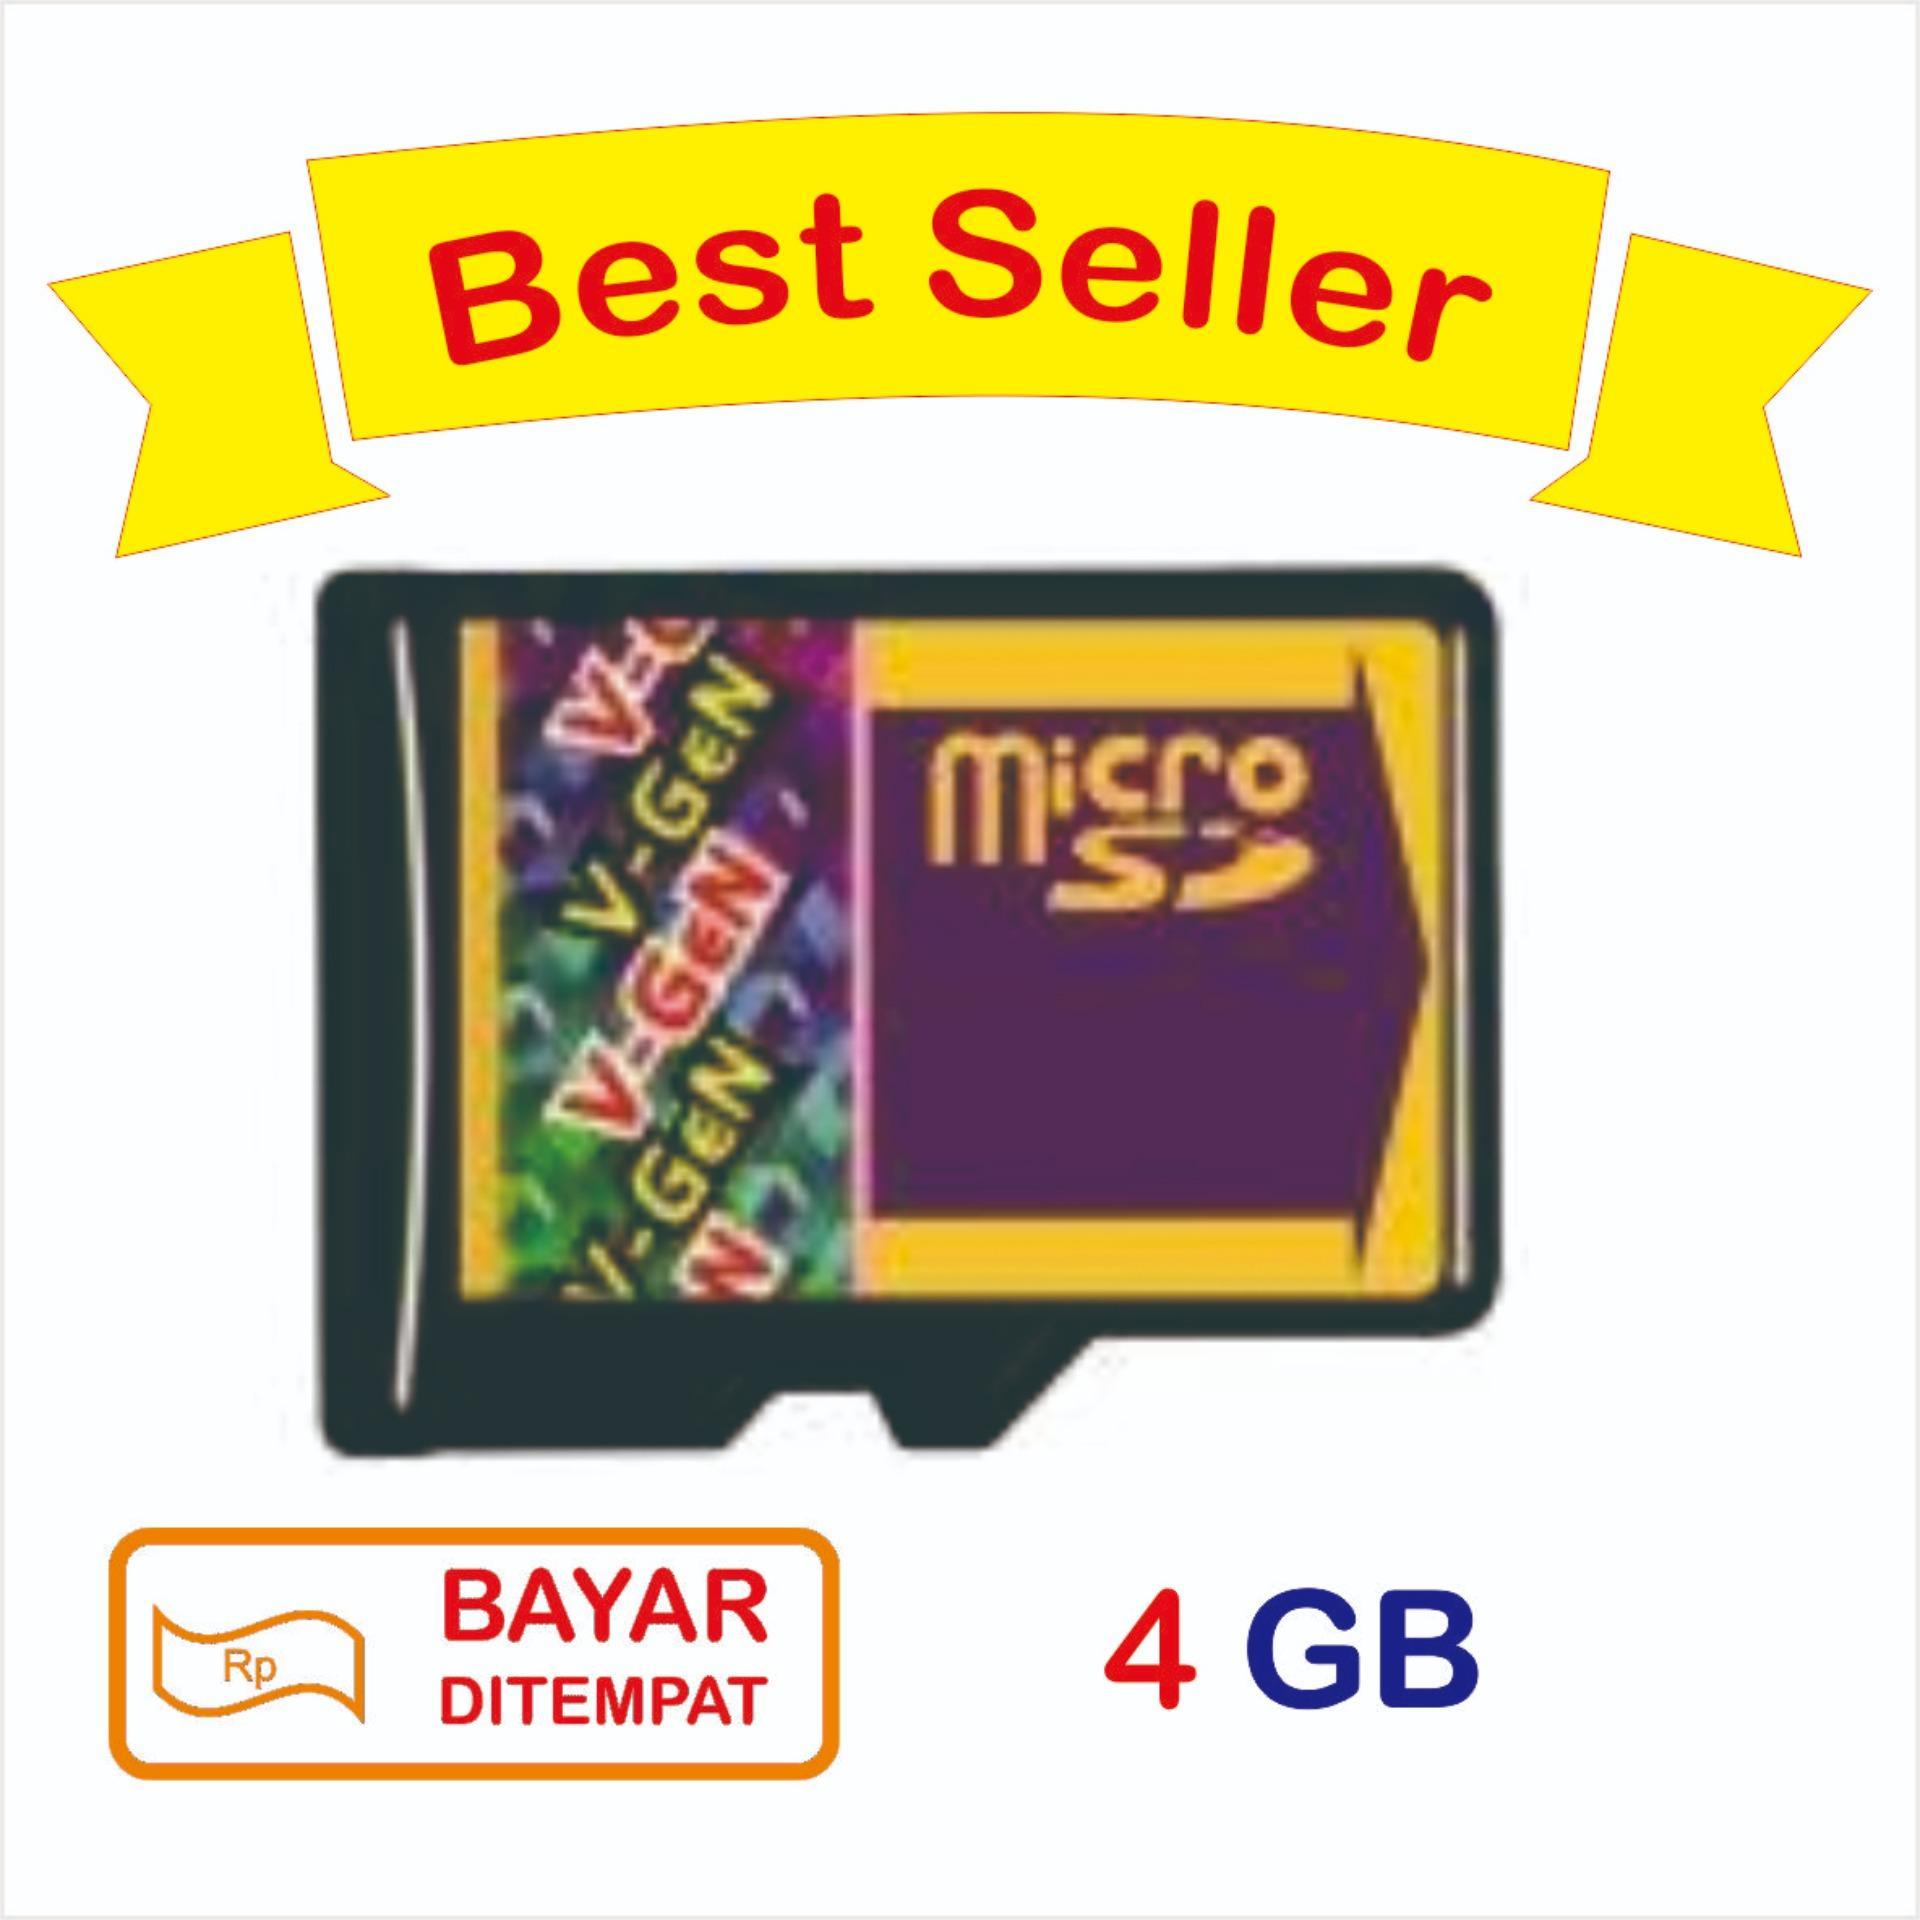 Jual Produk V Gen Asli Terbaik Terlaris Sdhc Card 4gb Micro Sd 4 Gb Class 6